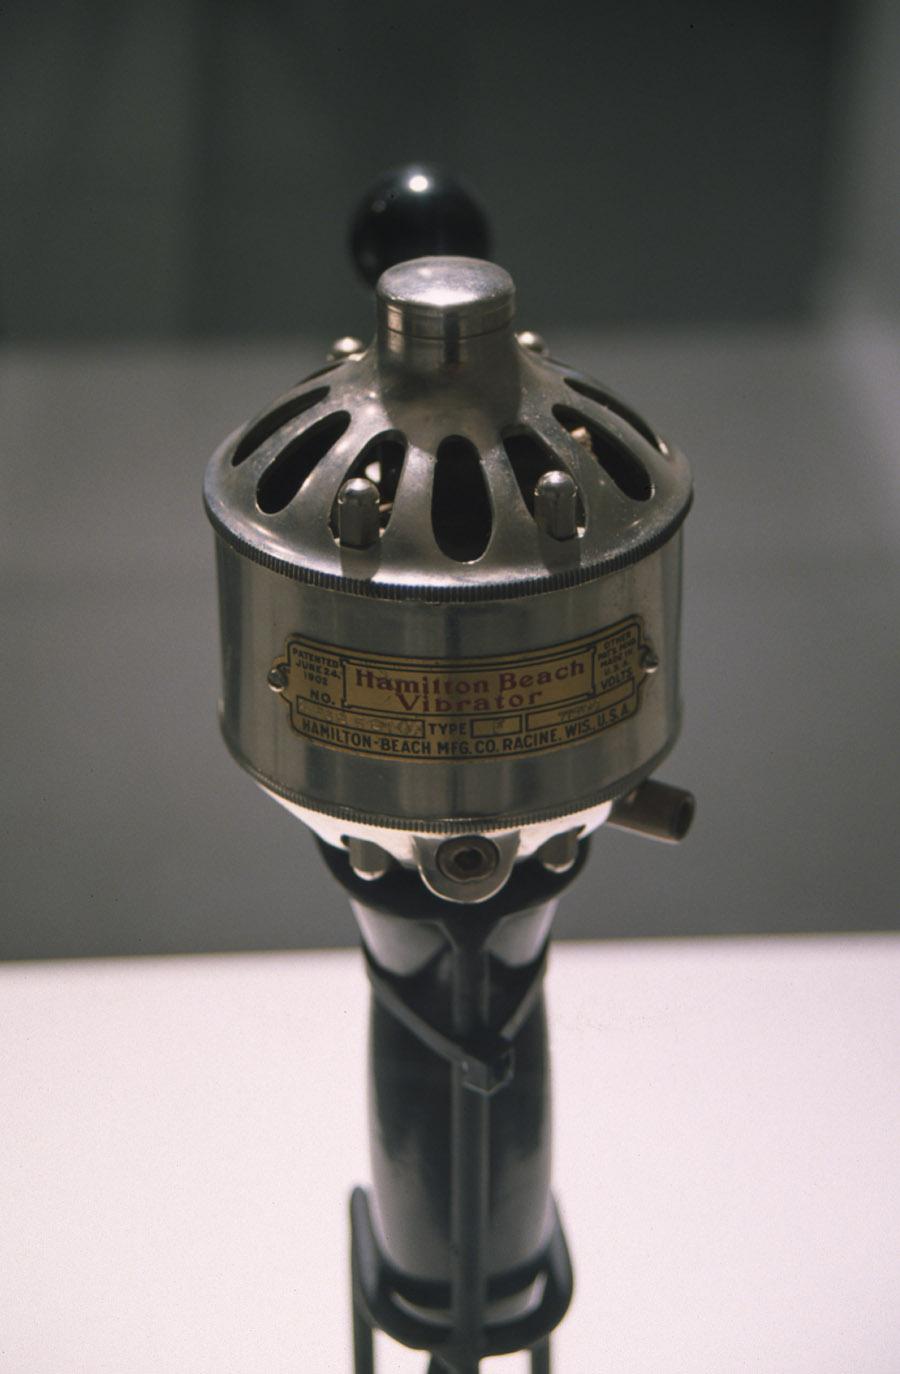 Detail, Hamilton Beach antique vibrator, 1903